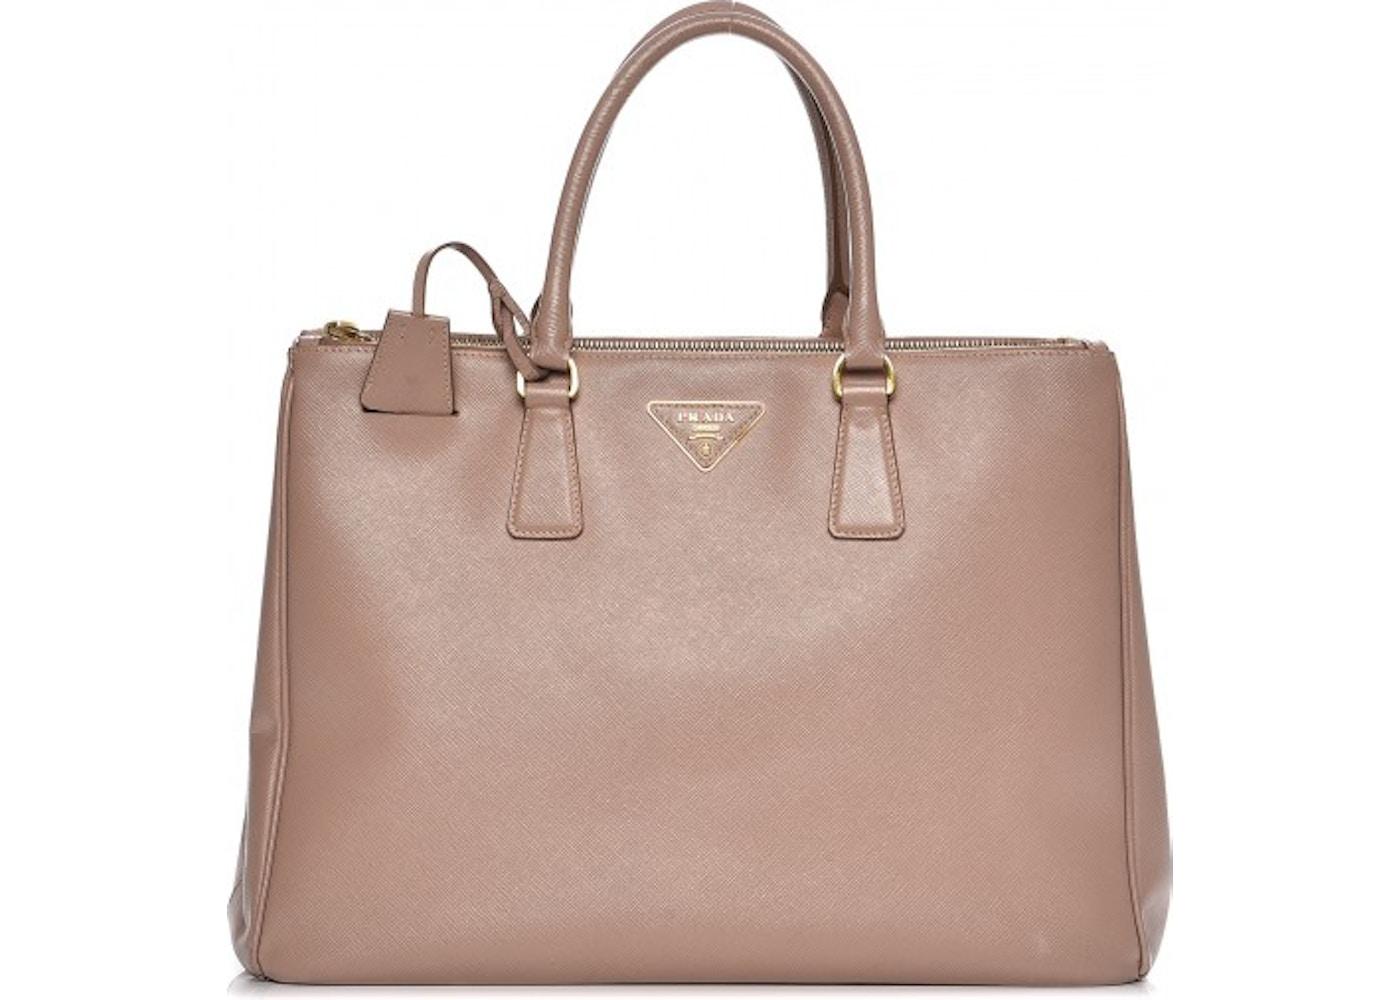 9460d72108bb Prada Galleria Double Zip Tote Saffiano Large Cammeo Beige Pink. Saffiano  Large Cammeo Beige Pink